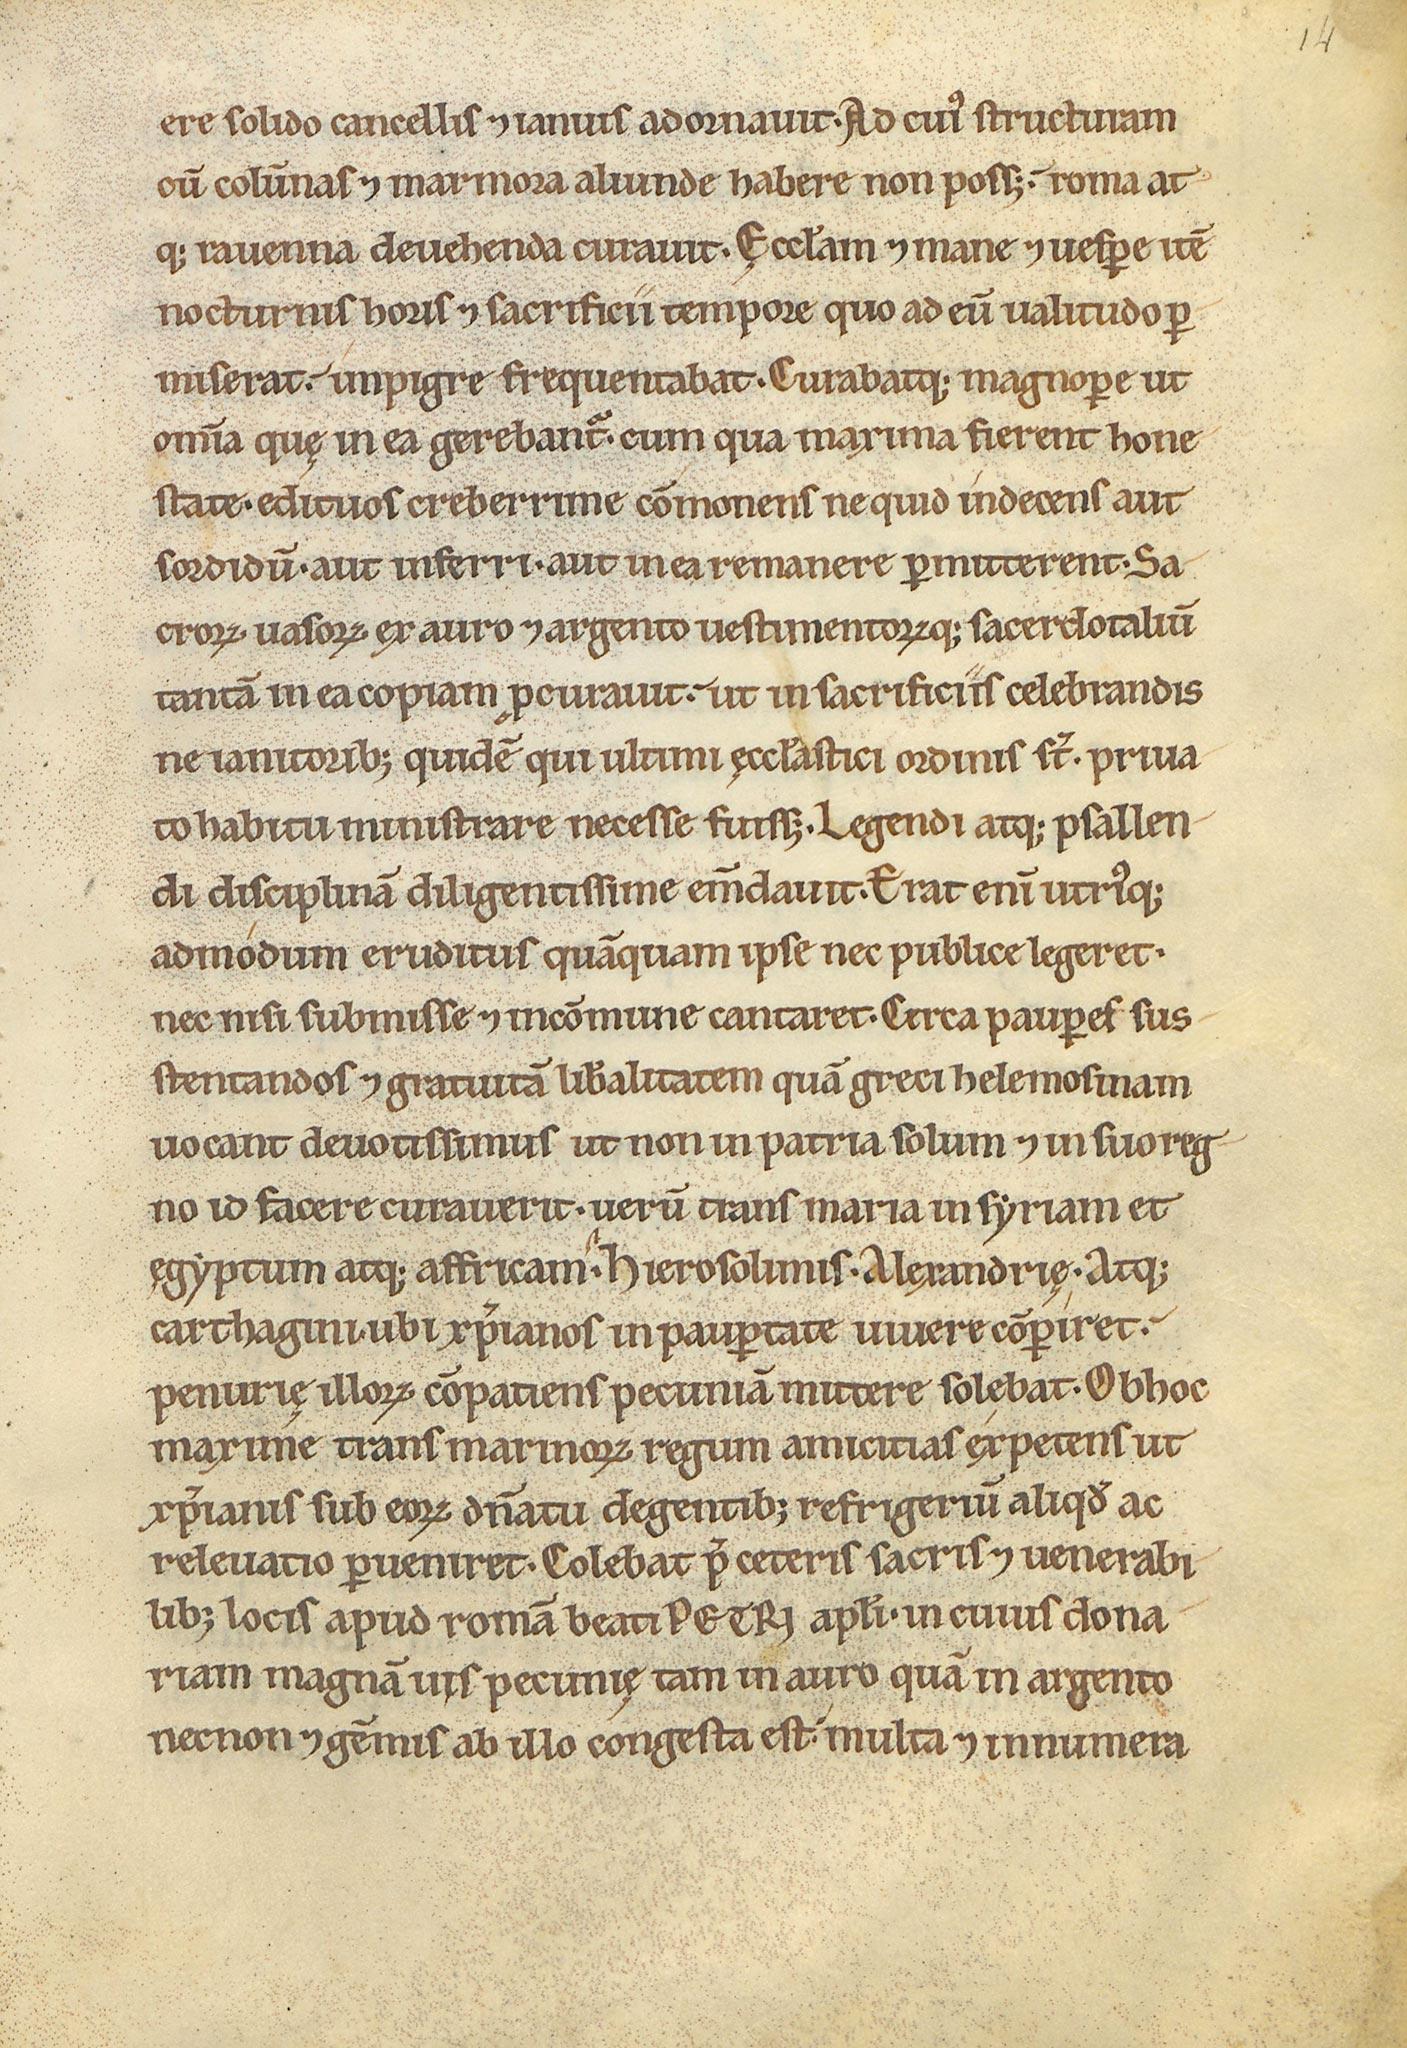 Manuscrit-Vita-Karoli-14r°